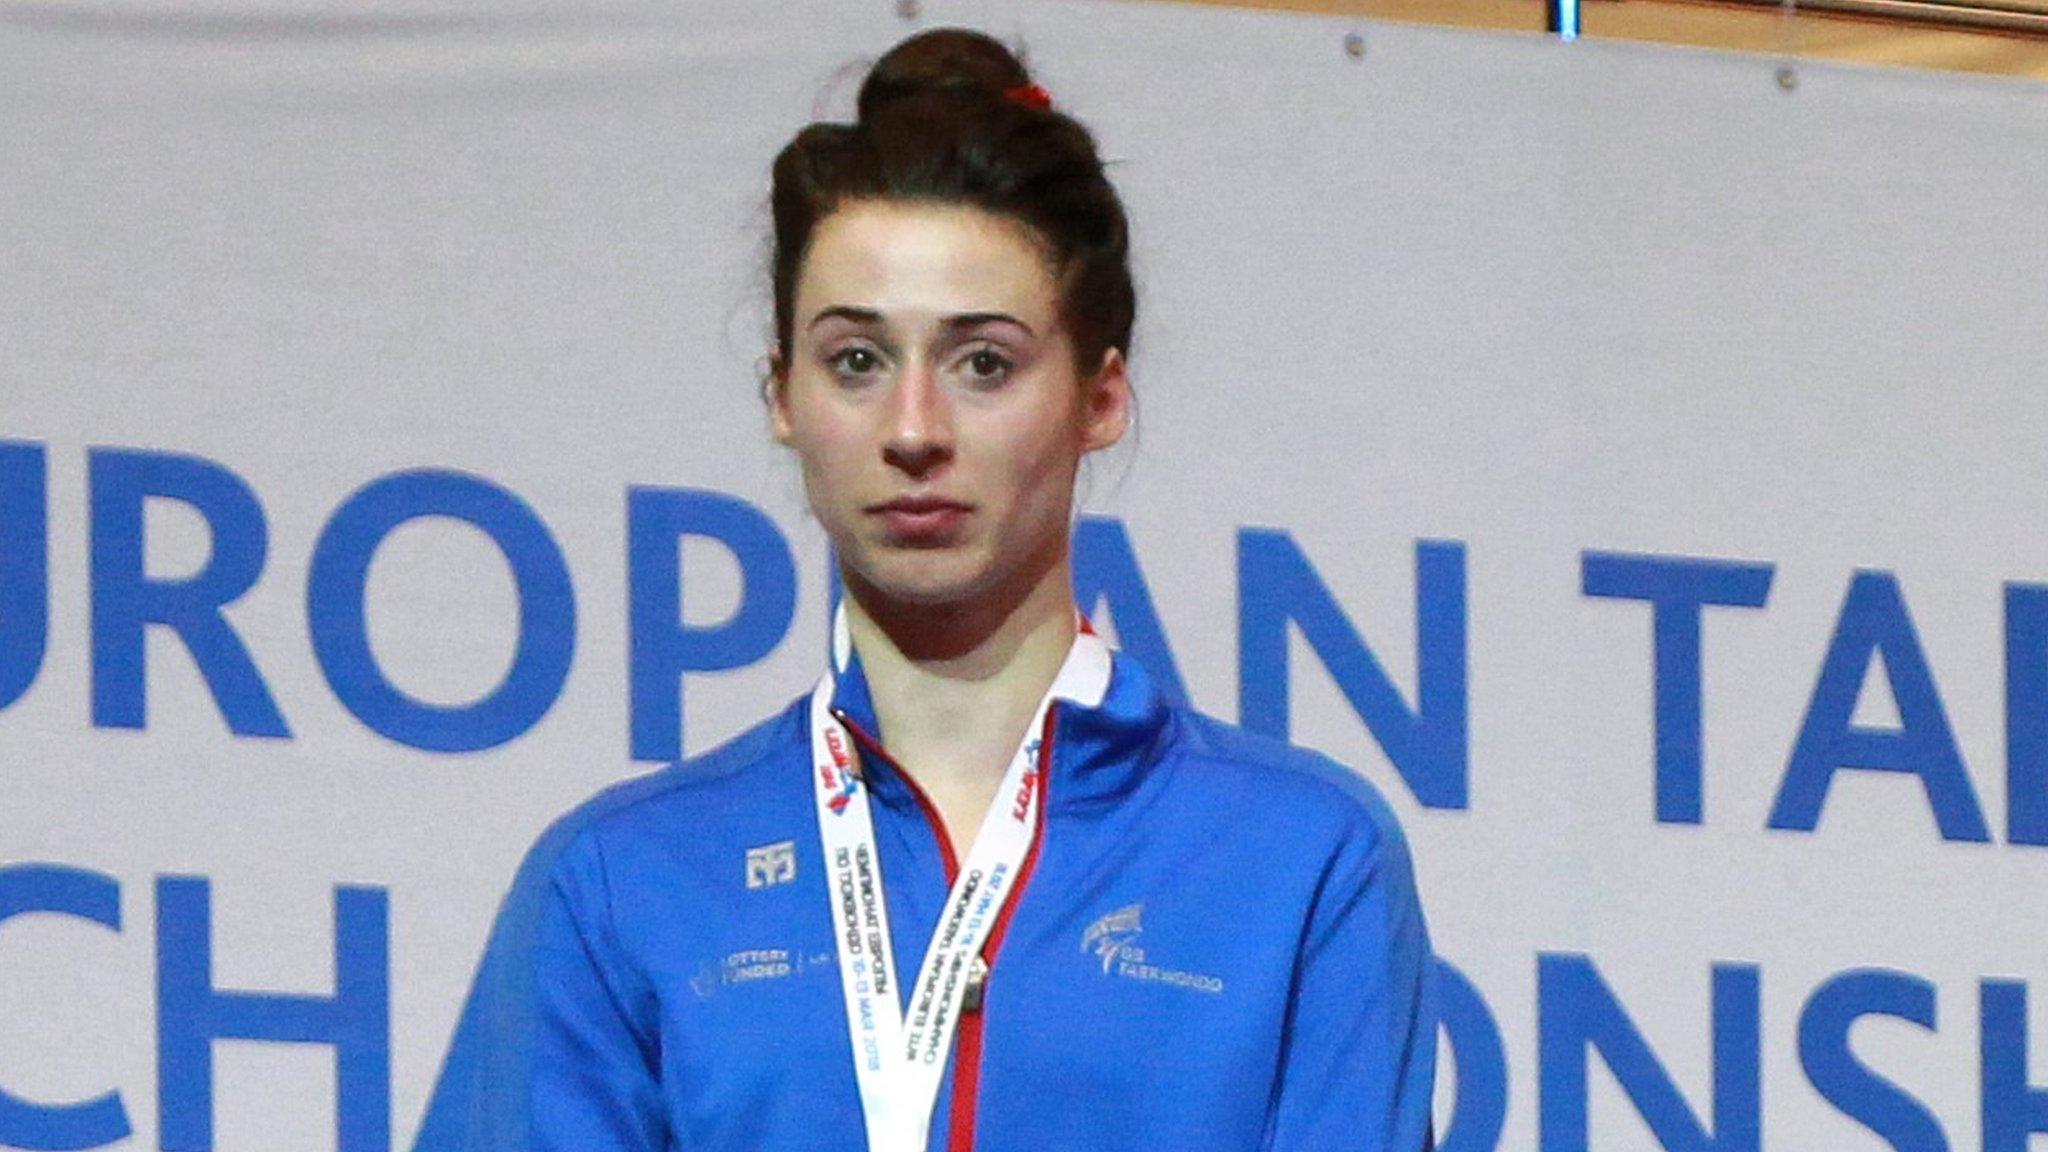 World Taekwondo Grand Prix: Bianca Walkden wins silver as Mahama Cho takes bronze